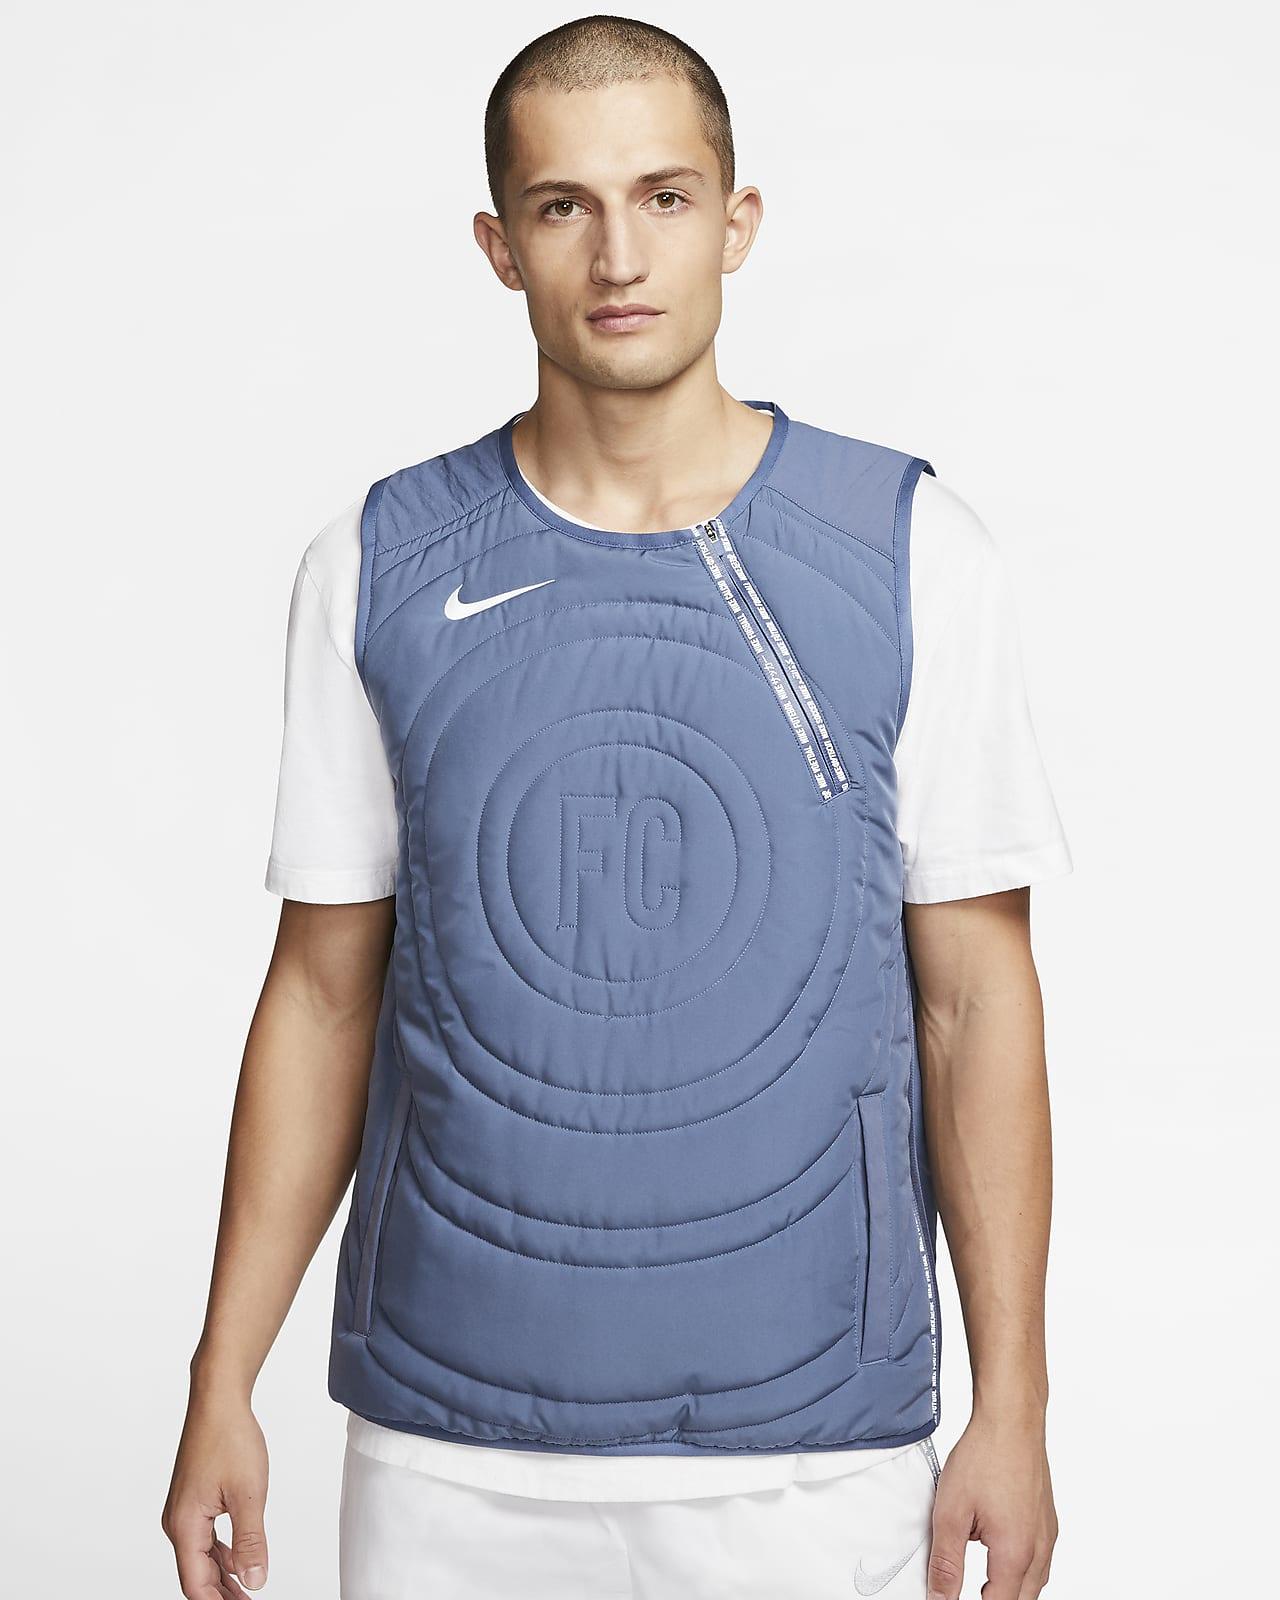 Nike F.C. Men's Football Gilet